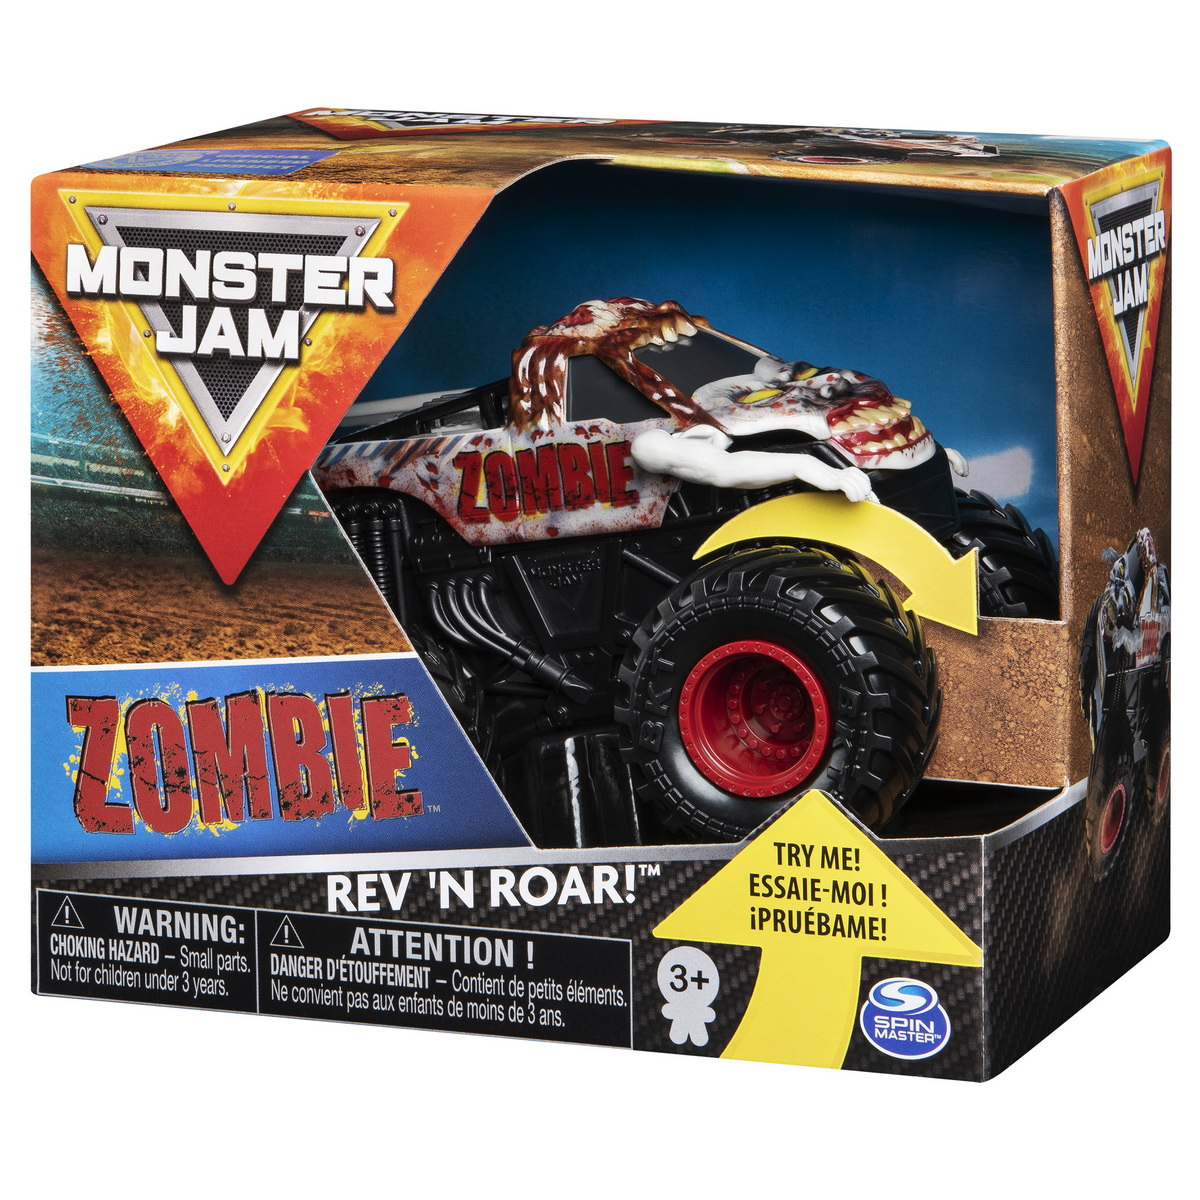 Monster Jam Metalice Seria Roar Scara 1 La 43 Zombie